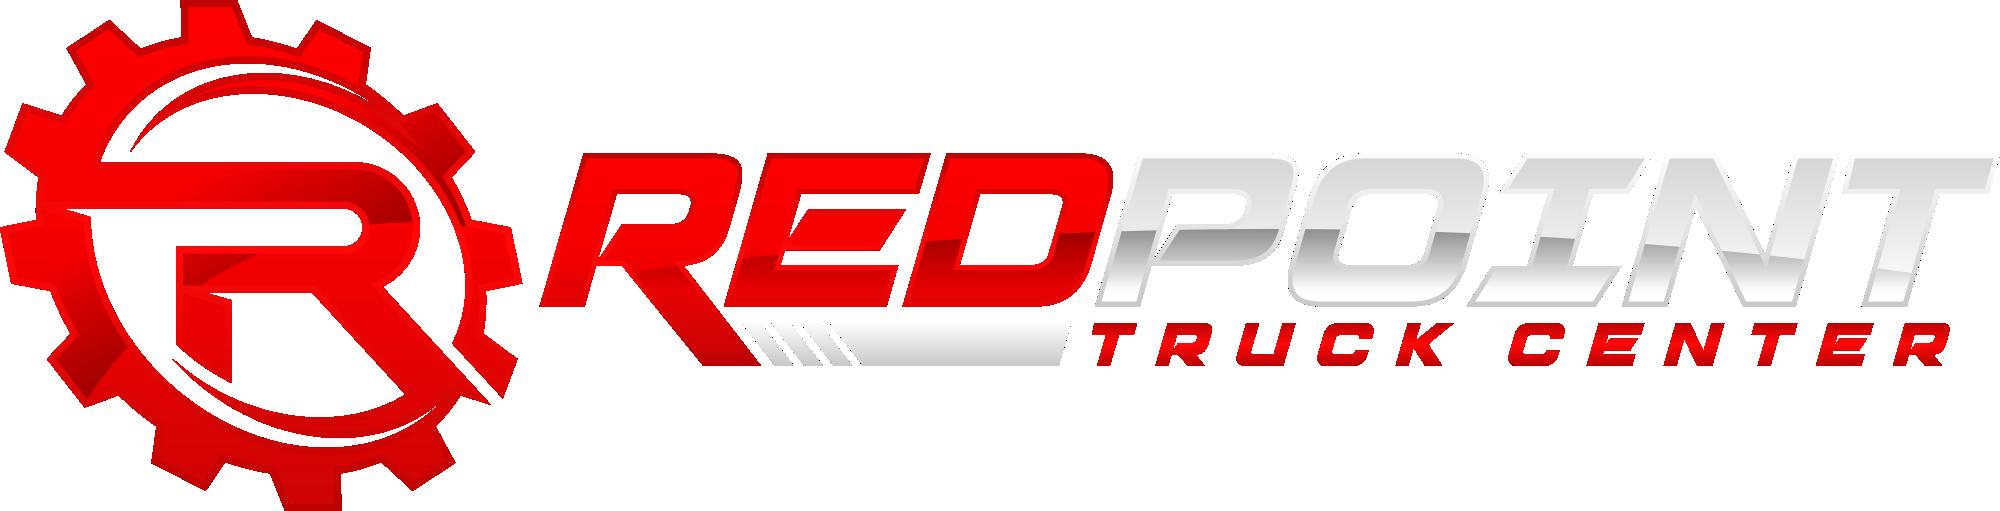 Create an amazing modern eye catching logo for a new truck and trailer mechanic shop